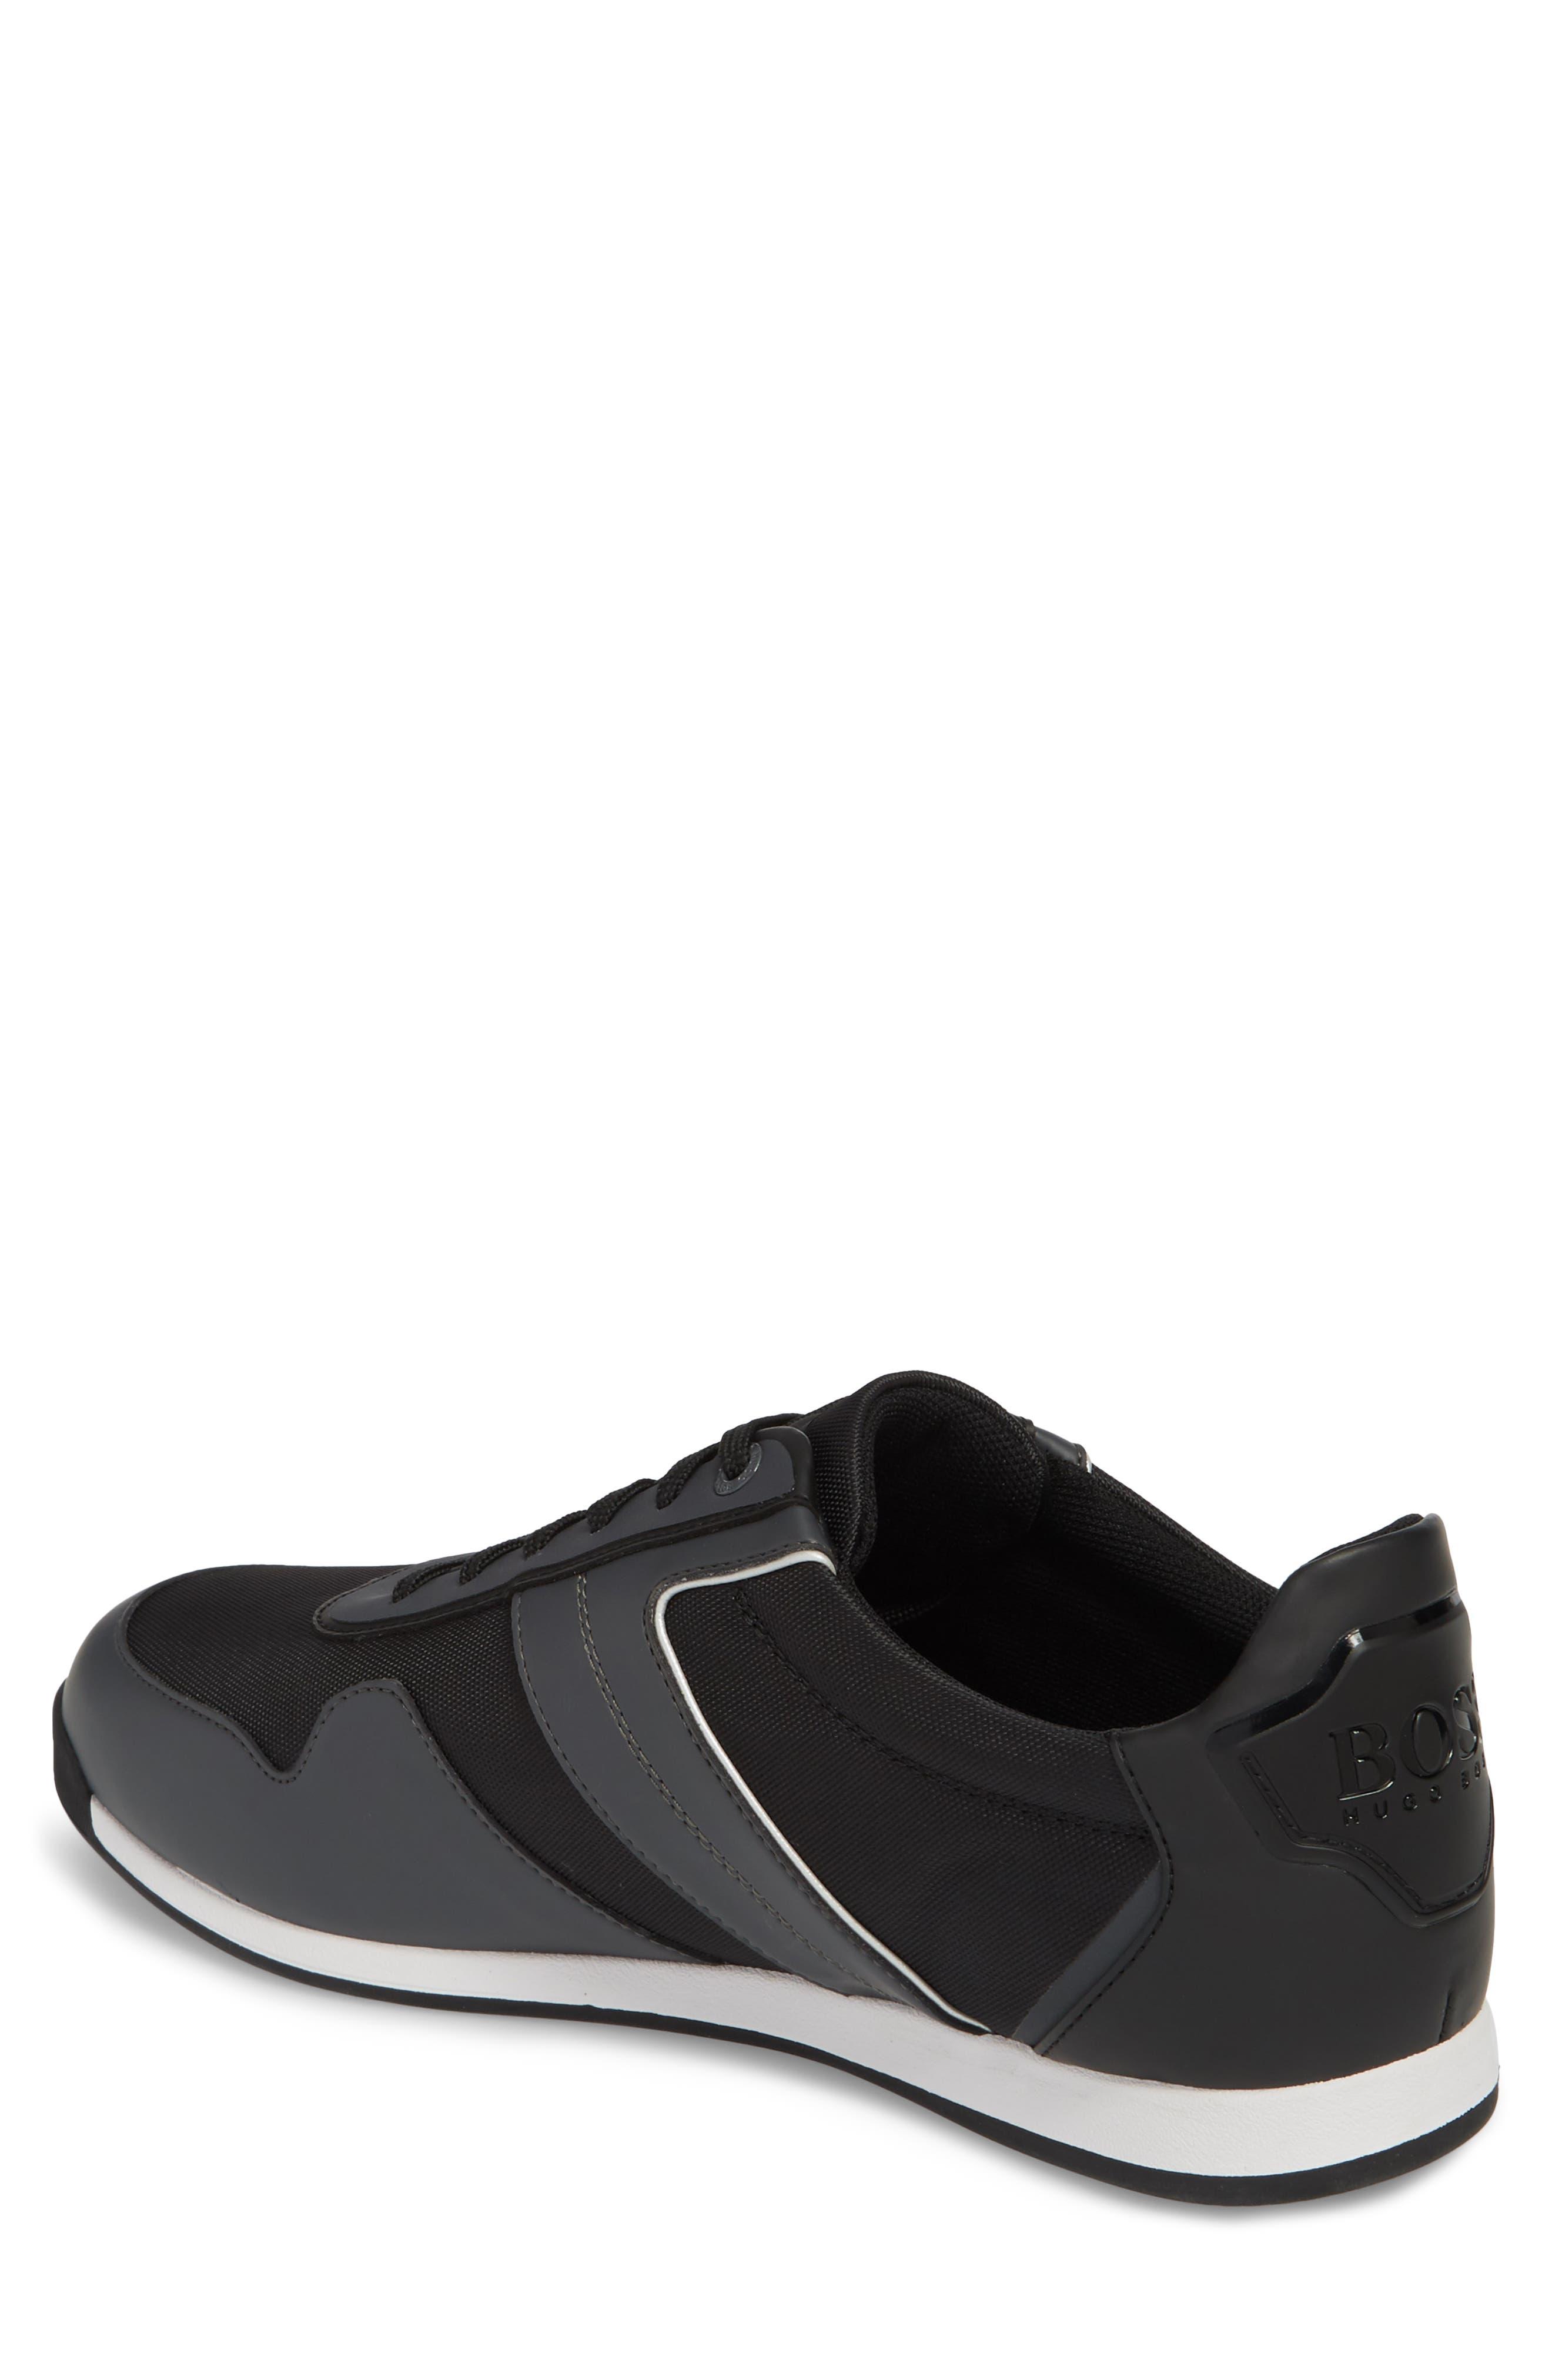 Maze Water Resistant Low Top Sneaker,                             Alternate thumbnail 2, color,                             020